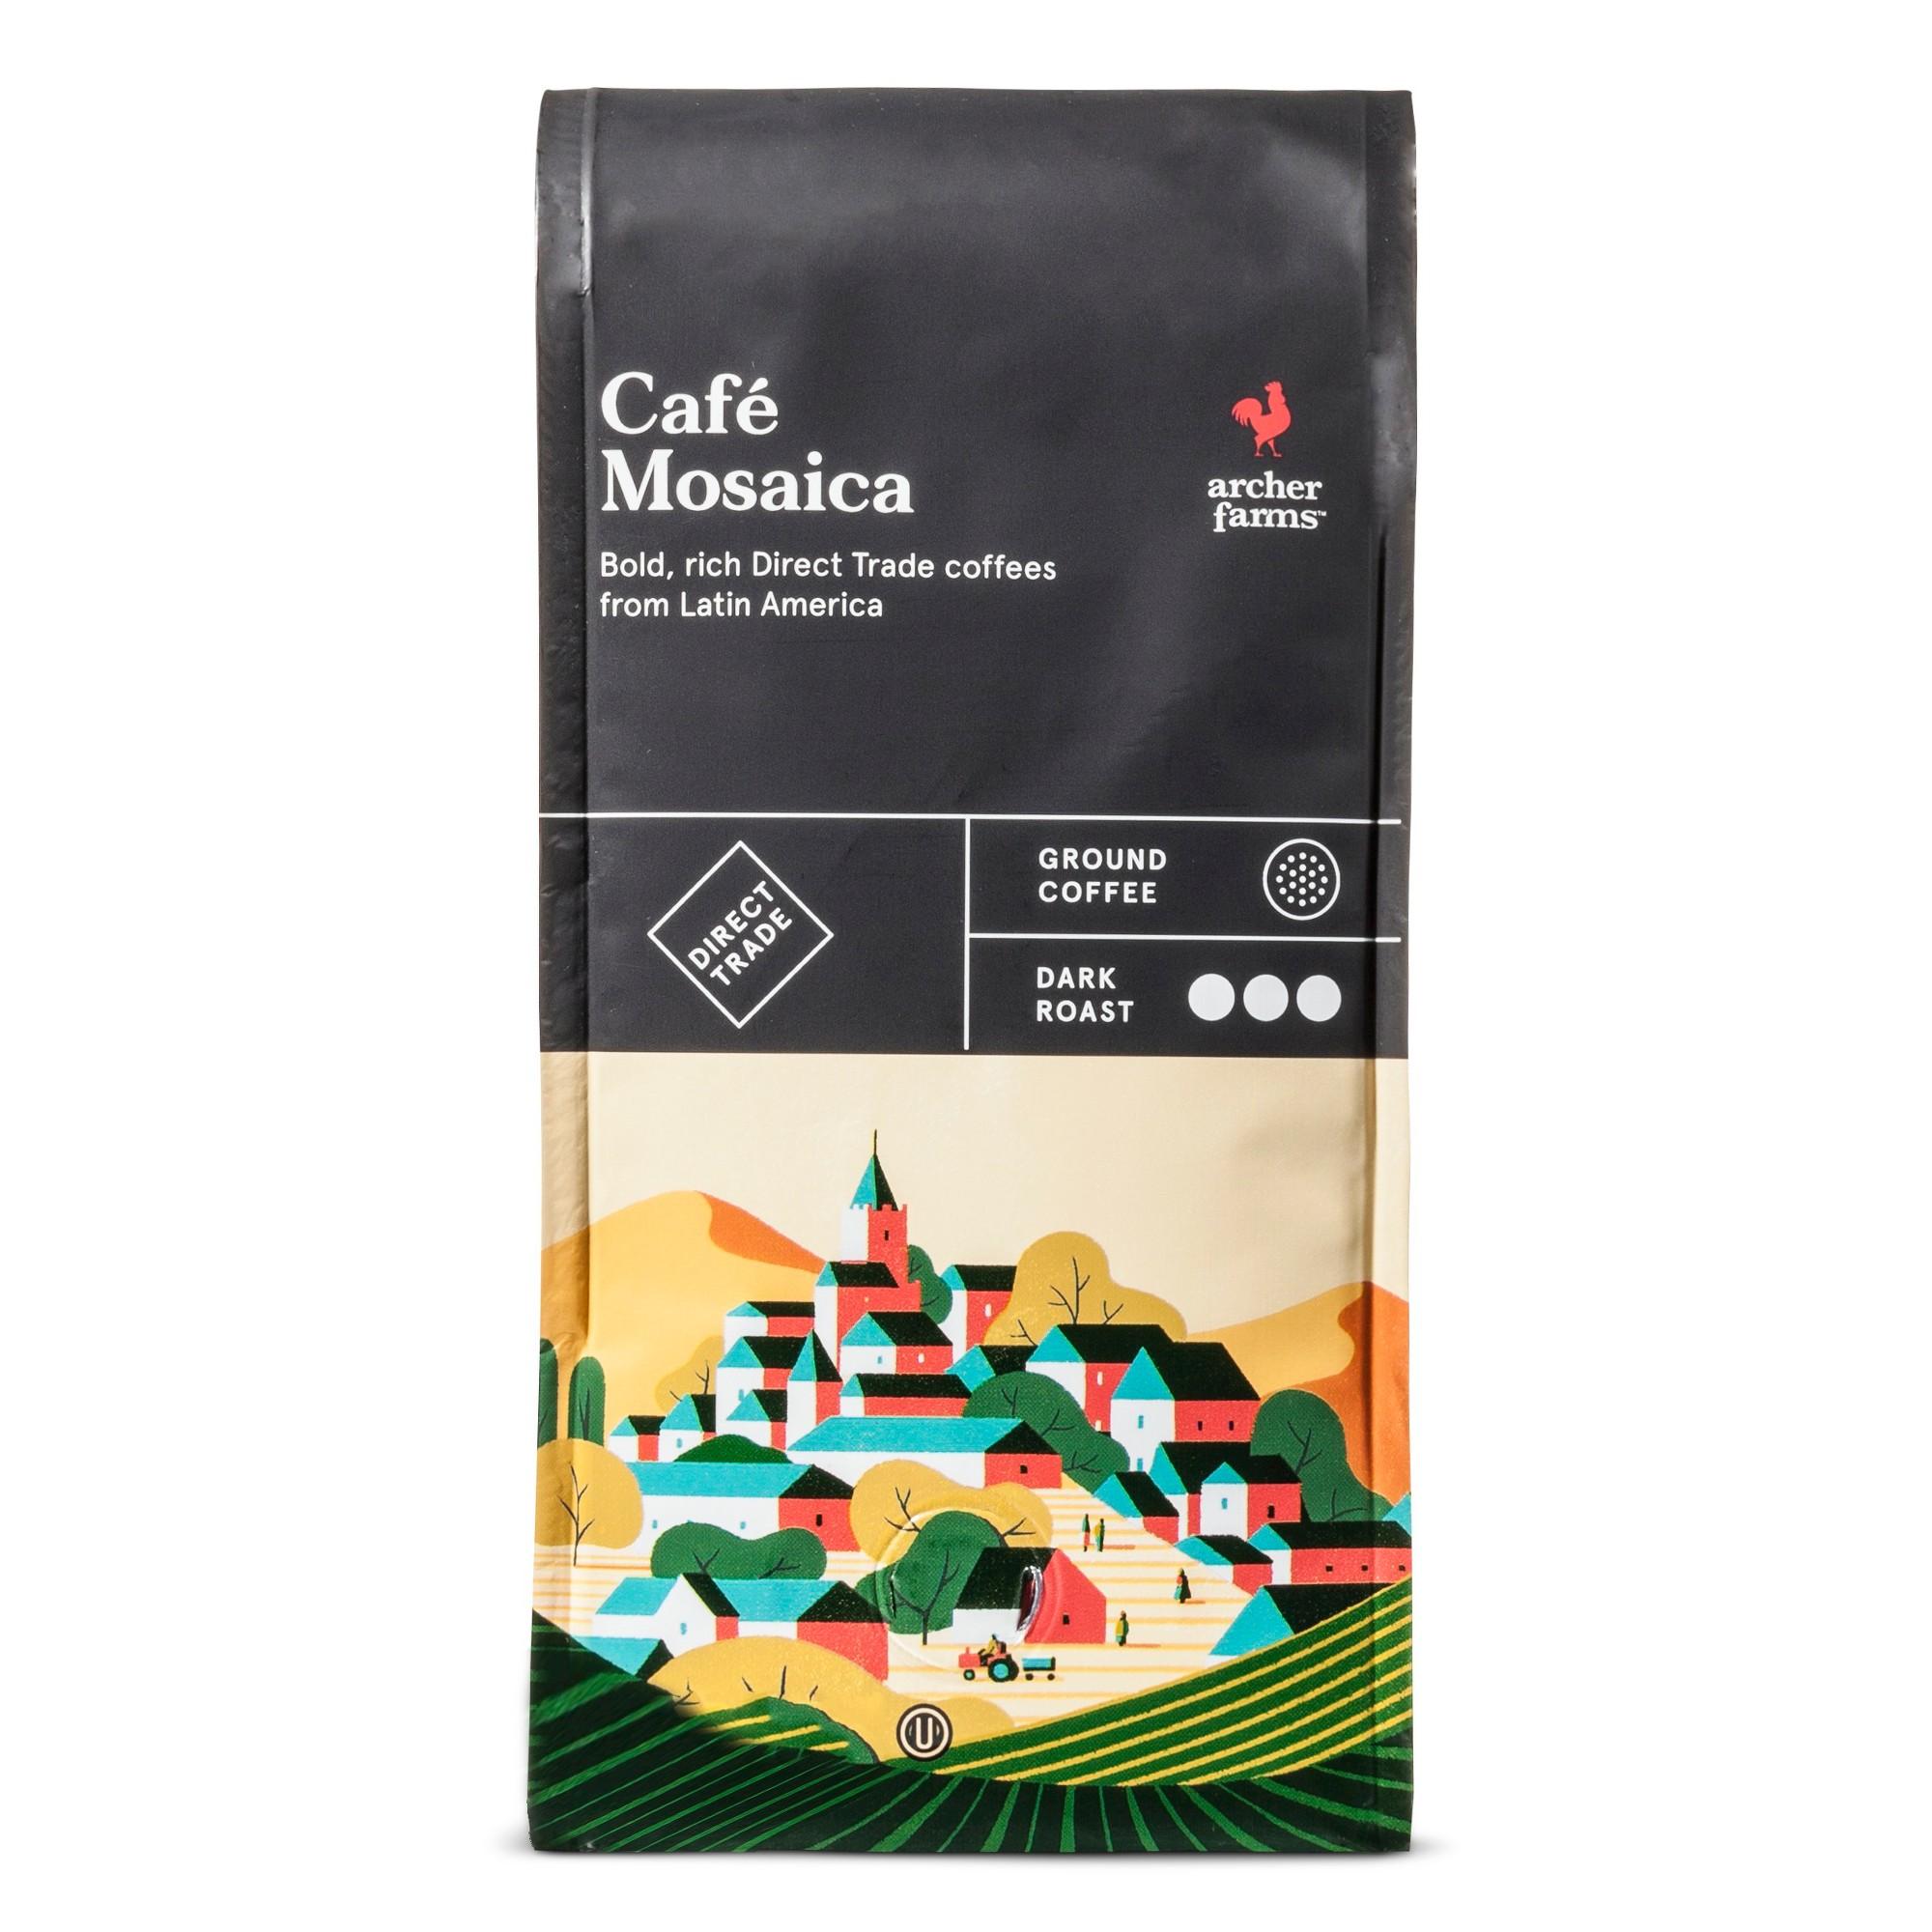 Küchenideen ziegel café mosaica dark roast ground coffee  oz  archer farms